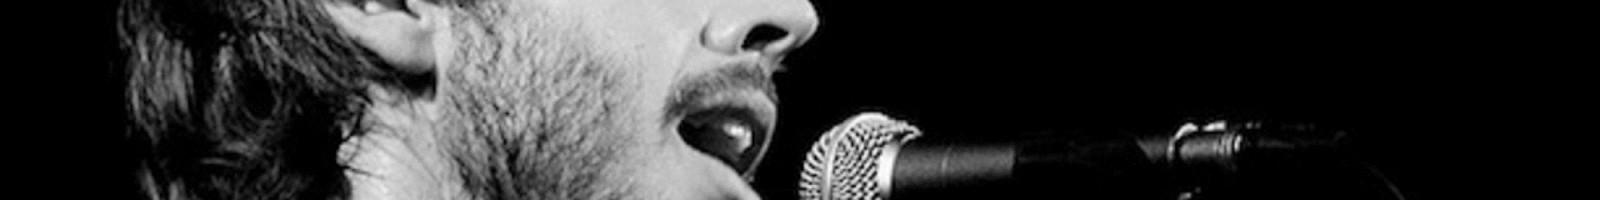 Right chord music new music blog playlists music marketing follow rcm stopboris Choice Image